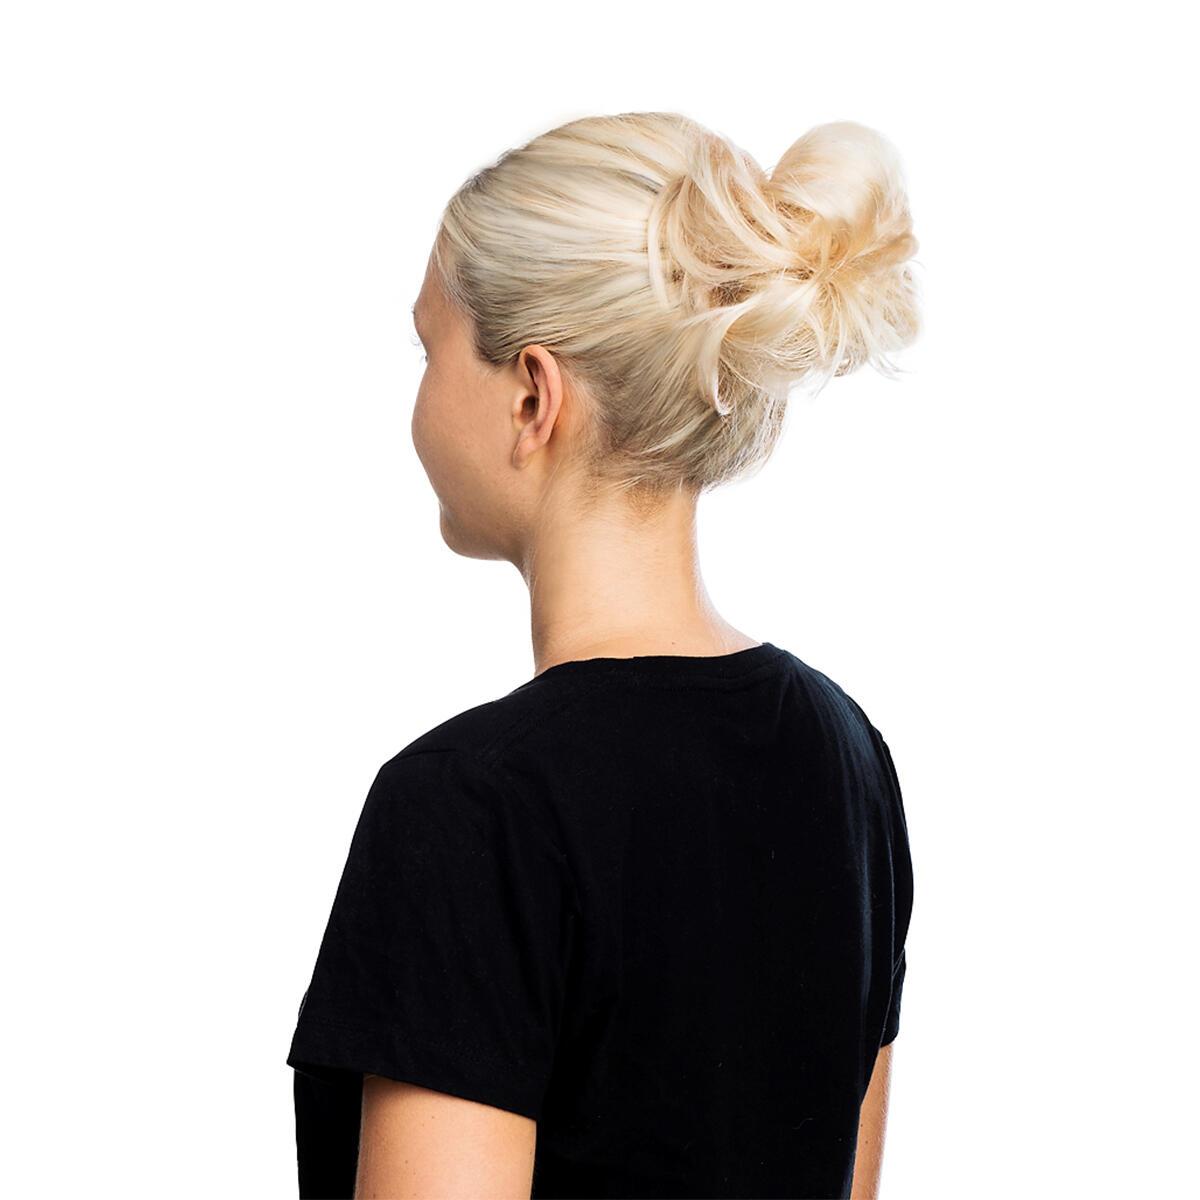 Volume Hair Scrunchie 40 G Scrunchie with real hair 8.3 Honey Blonde